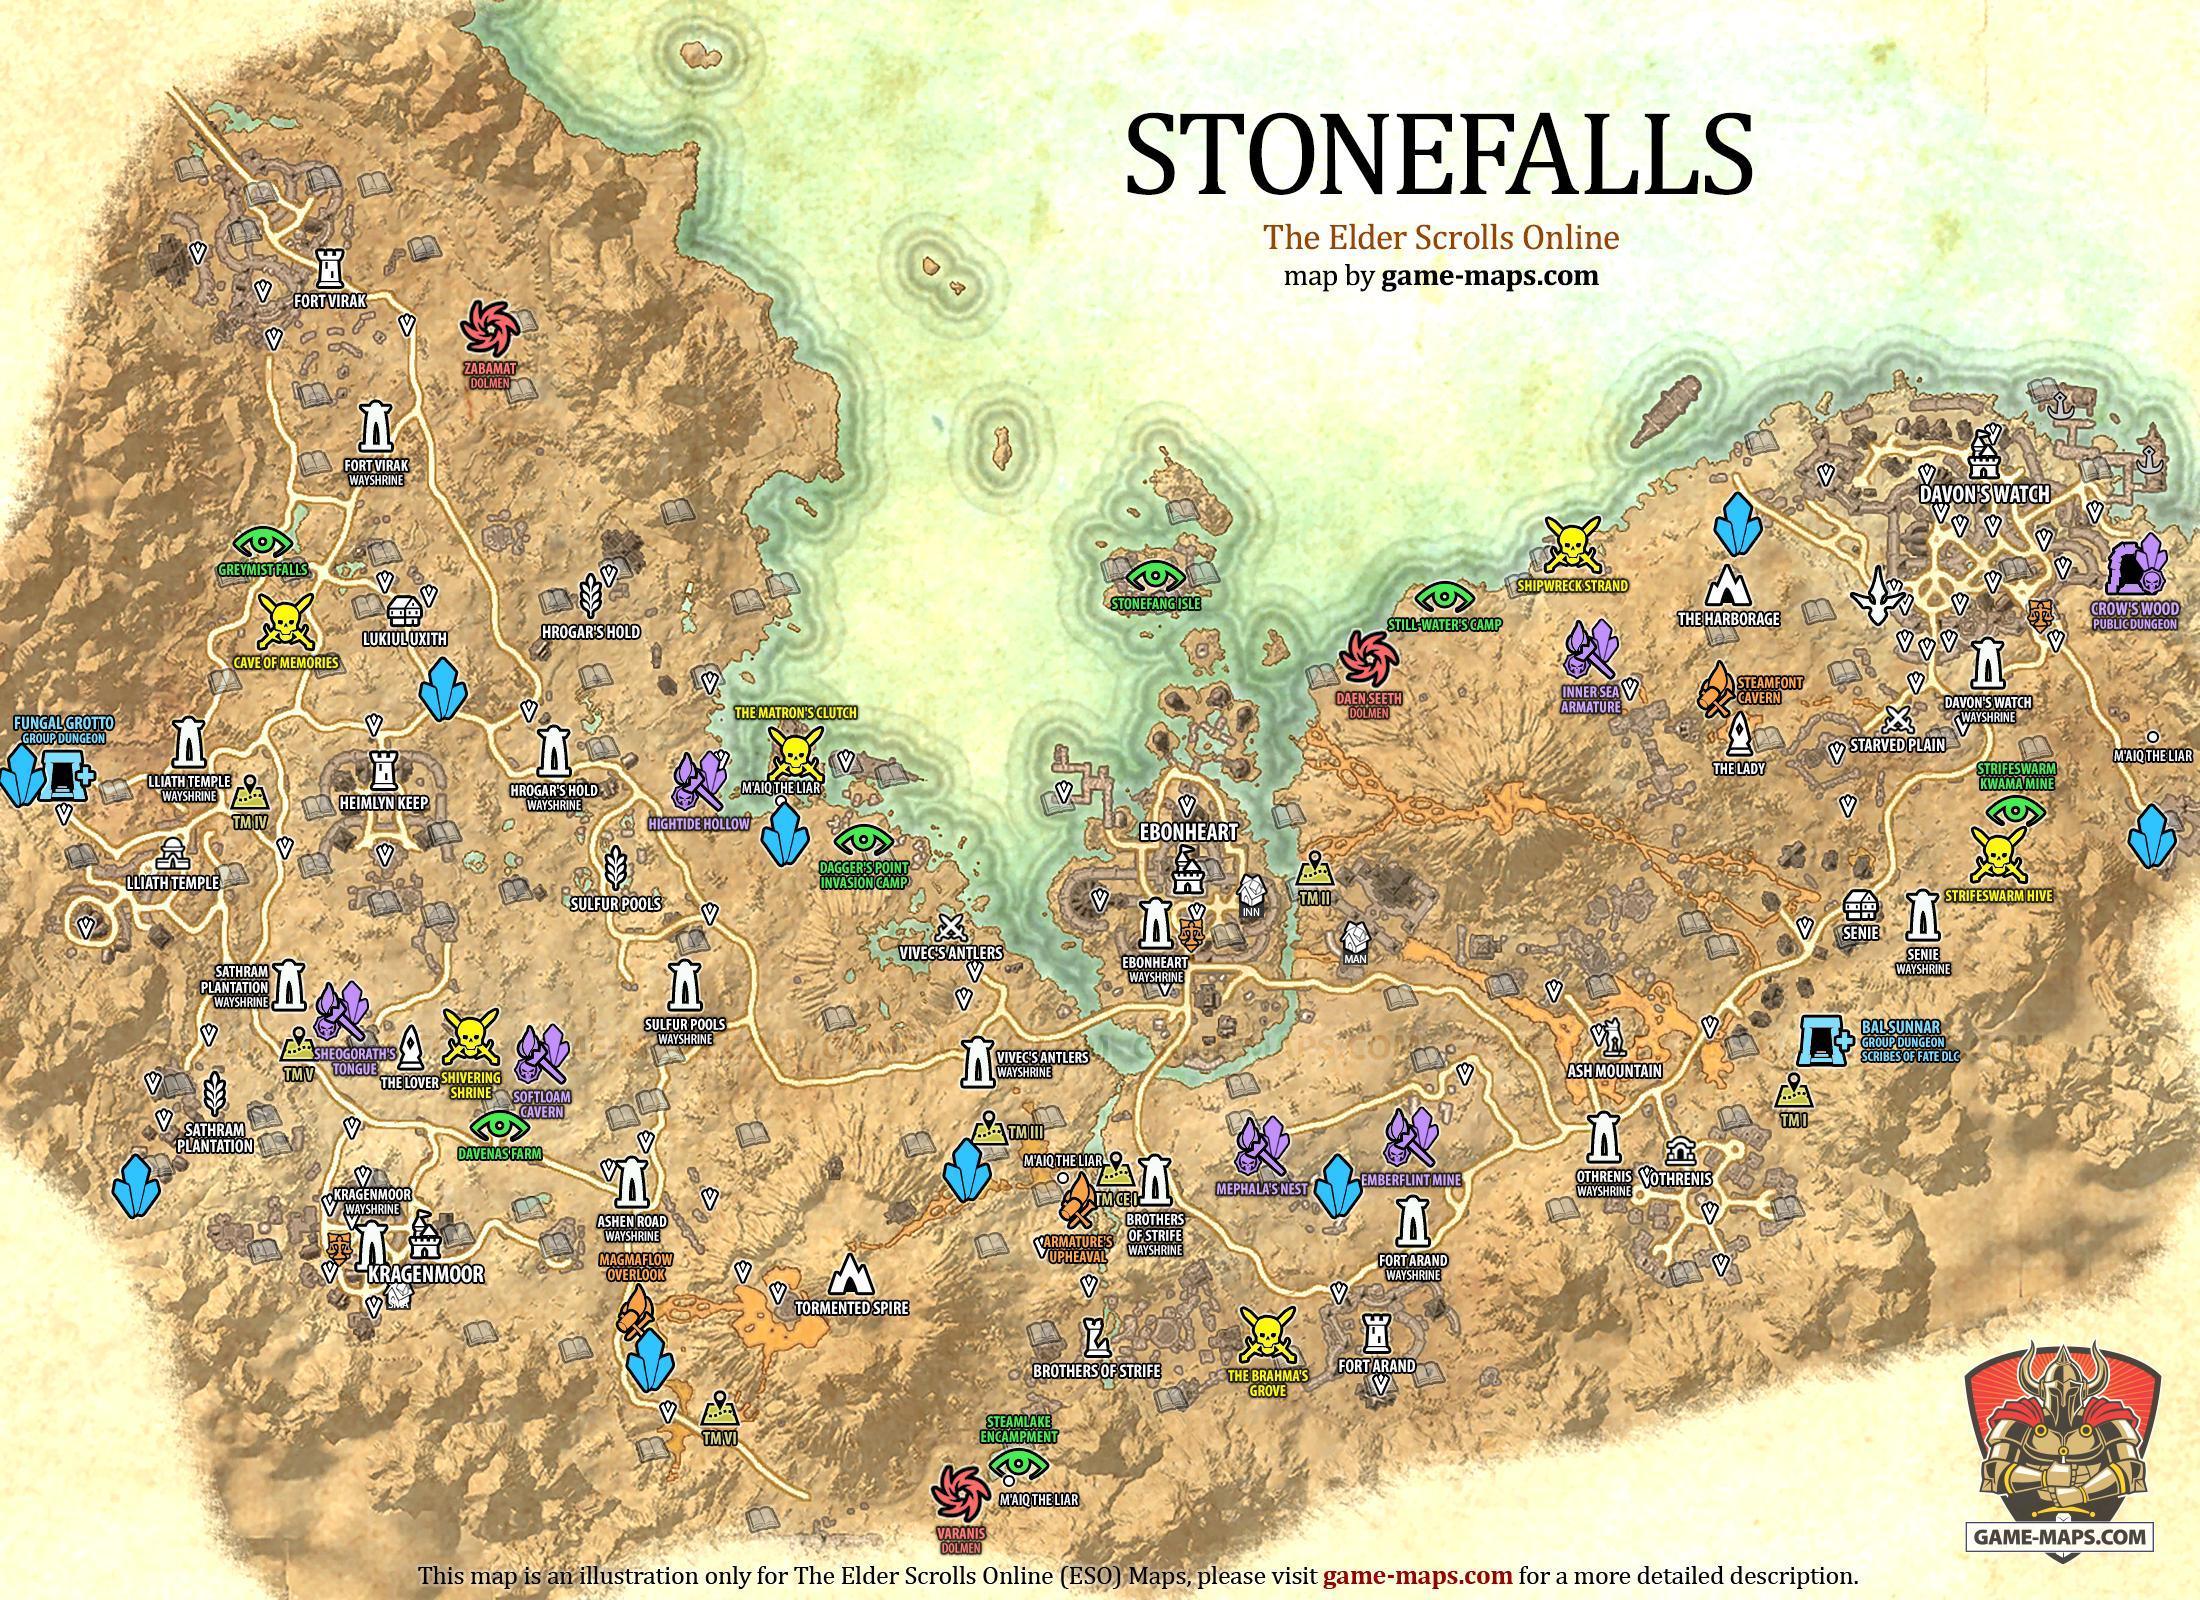 Legendary Rosin Eso Stonefalls Map